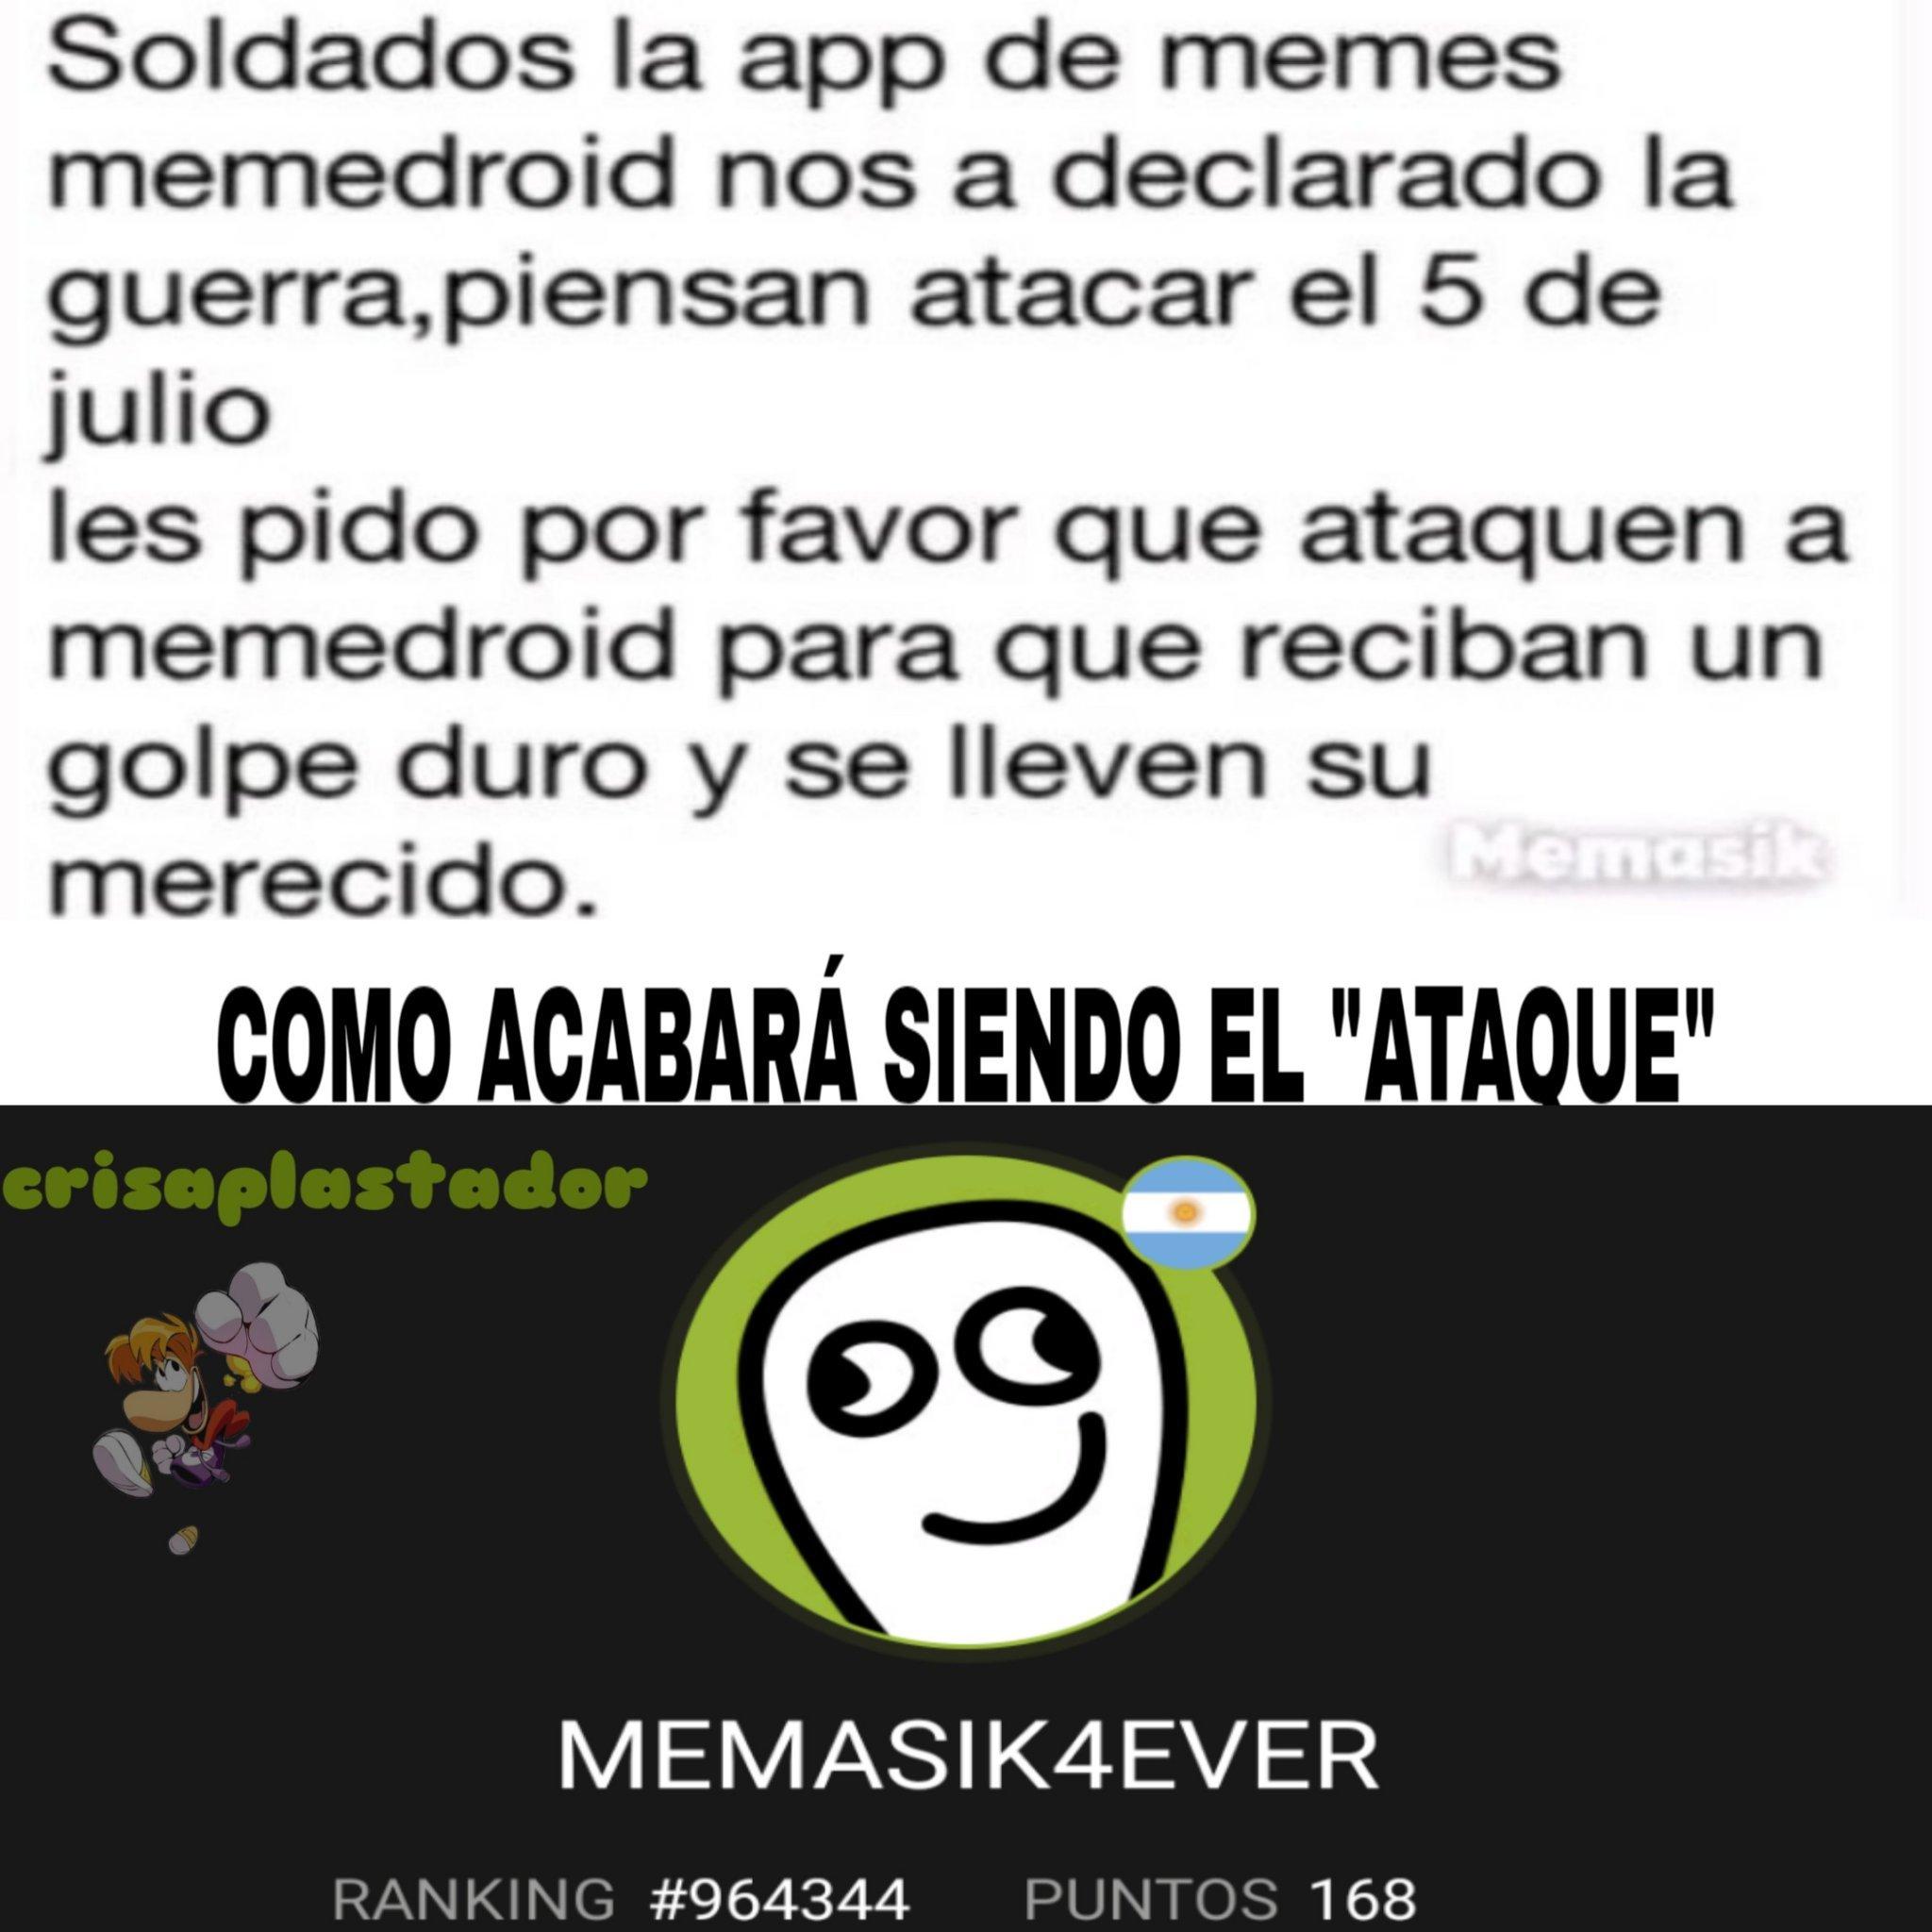 Menudos imbéciles los de memasik - meme